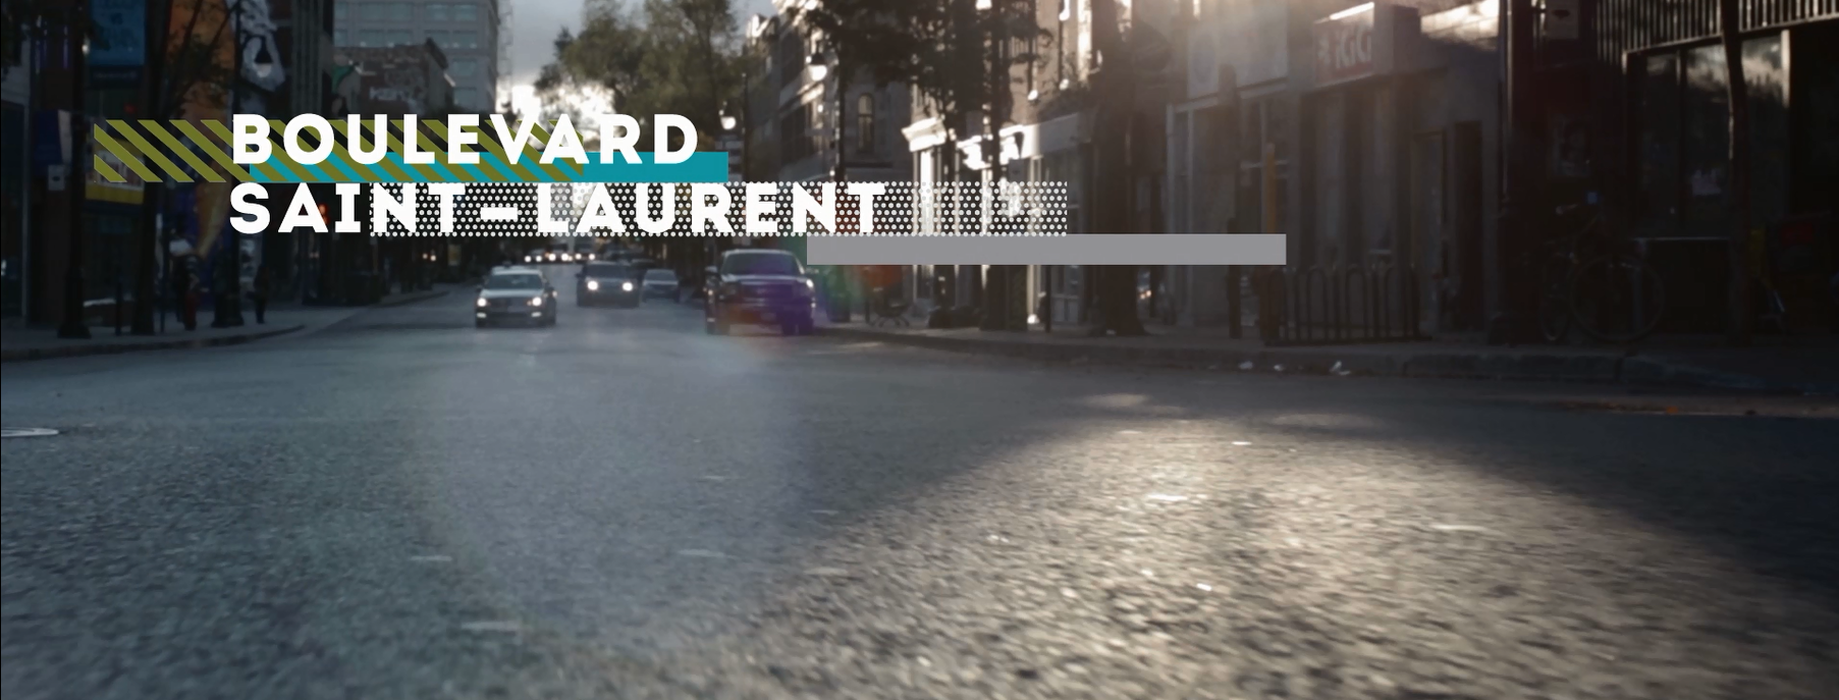 JeVoisSaintLaurent-Accueil